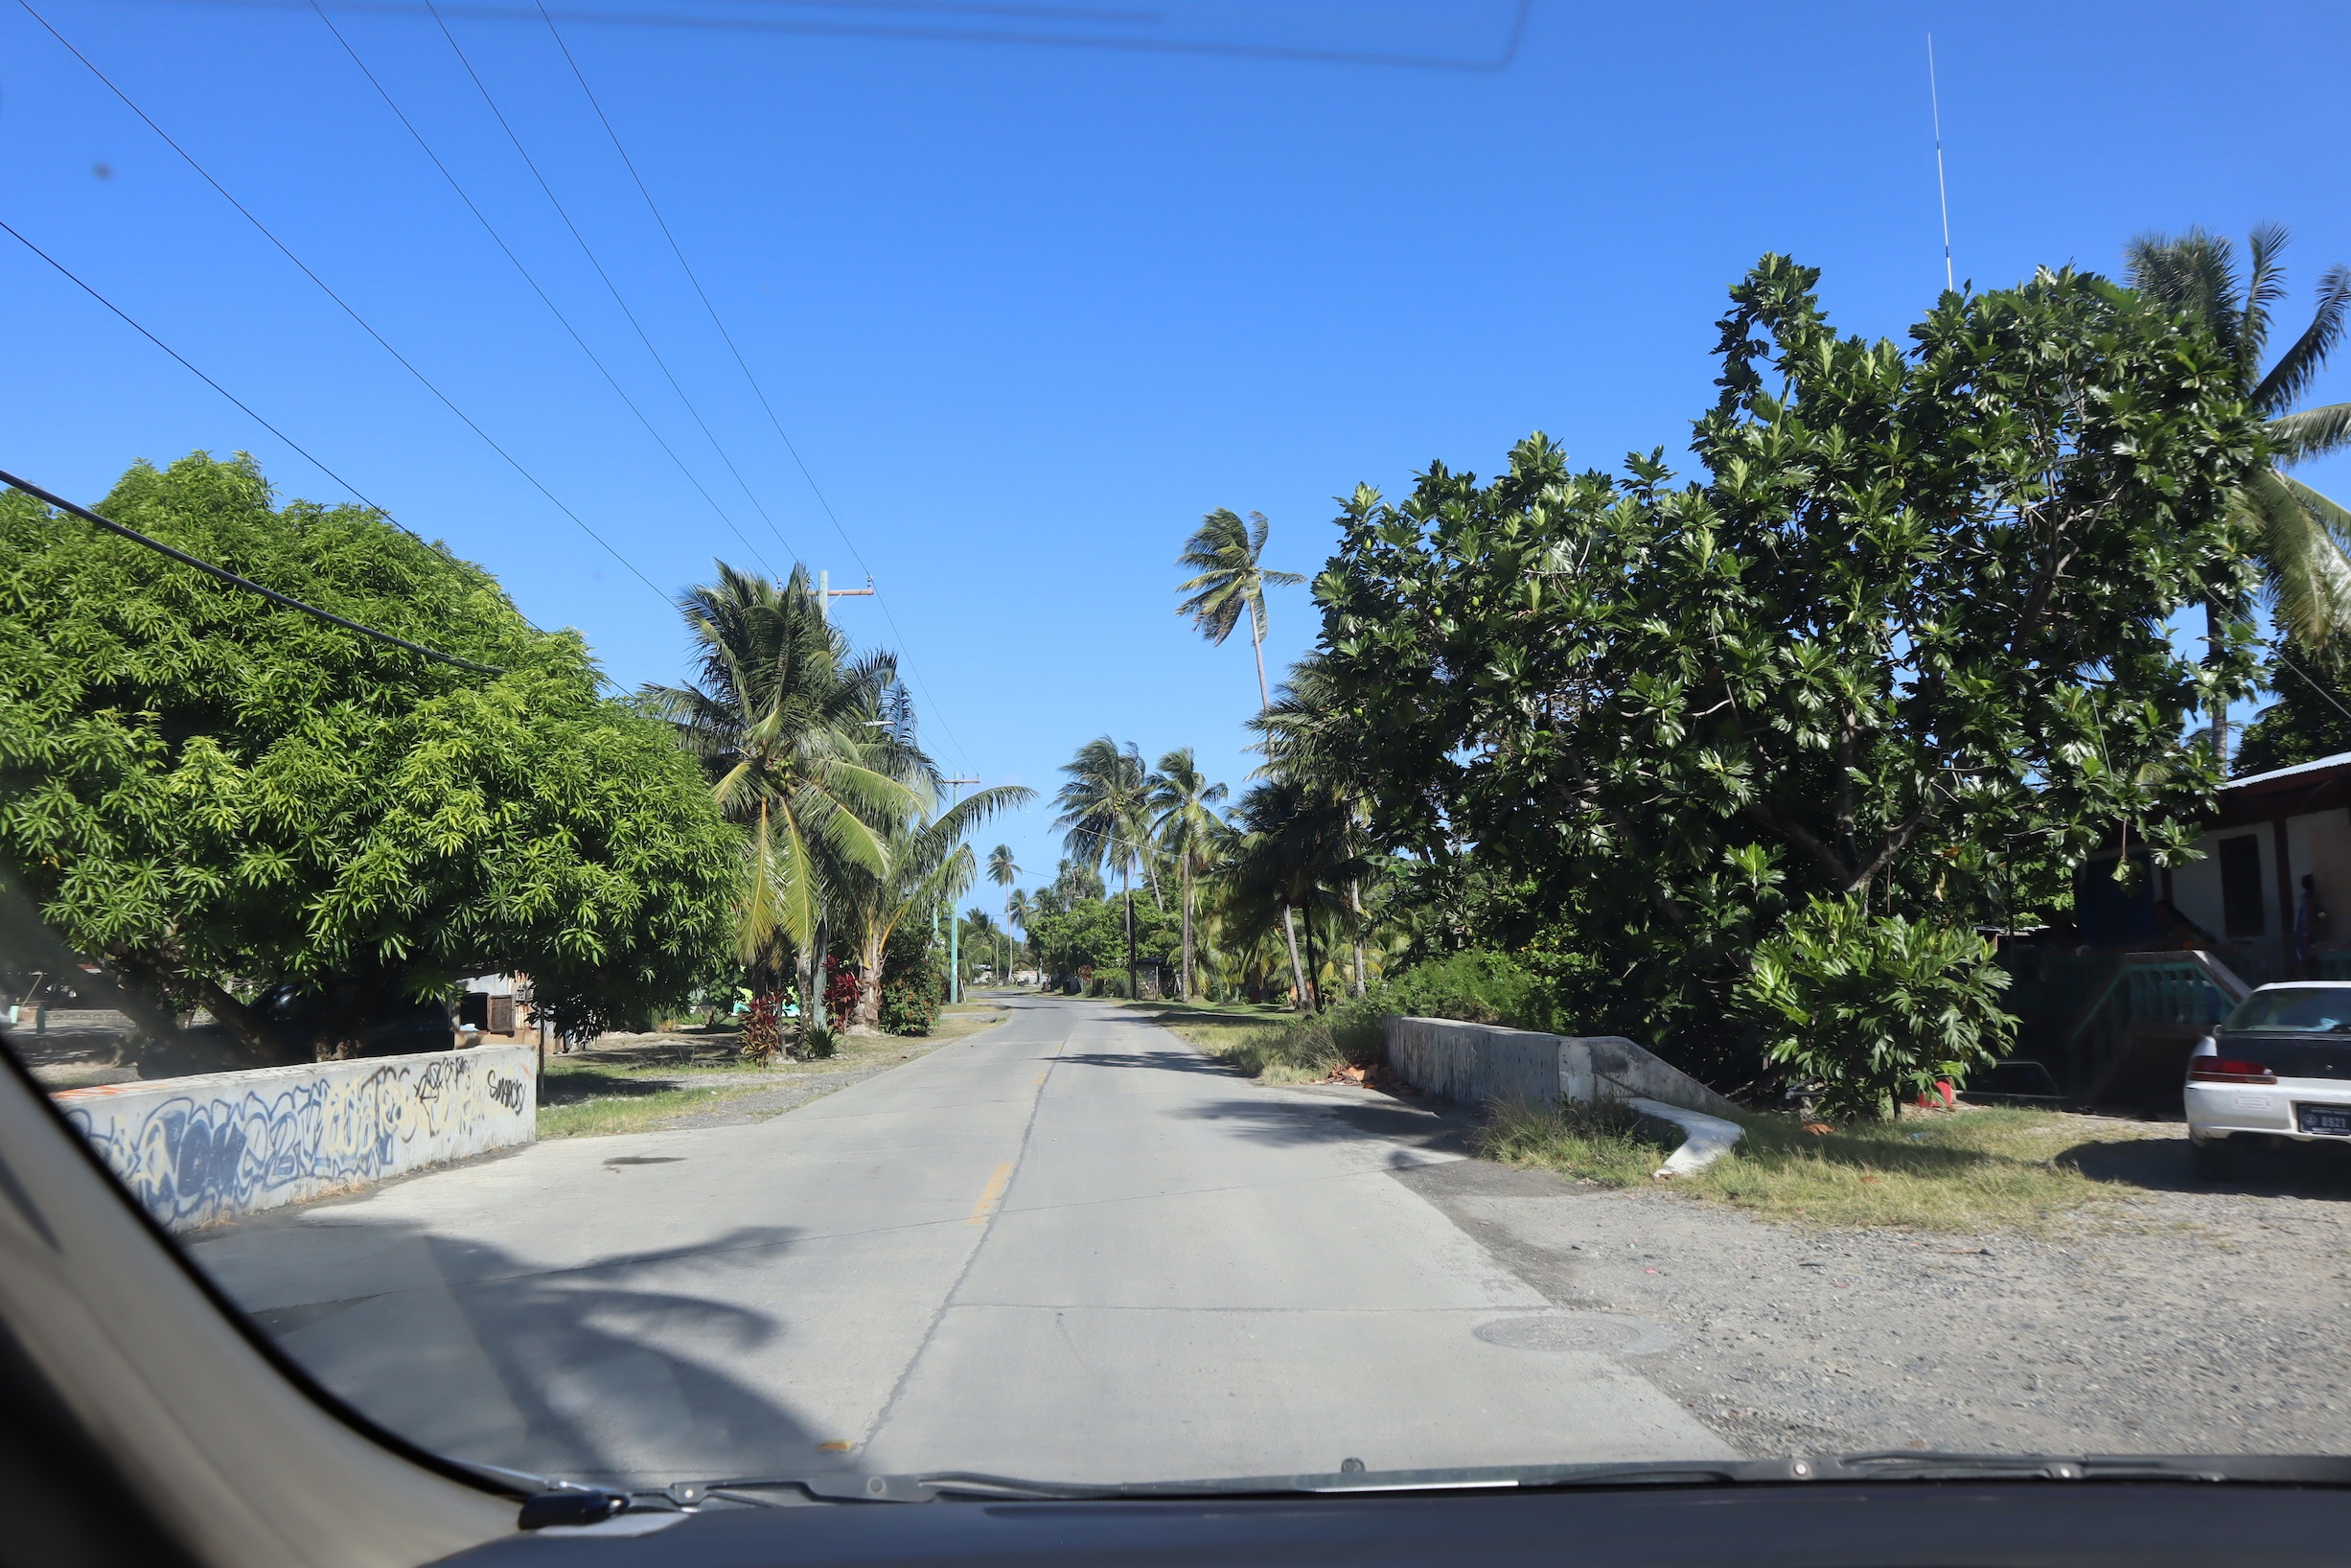 Driving back to Chuuk International Airport